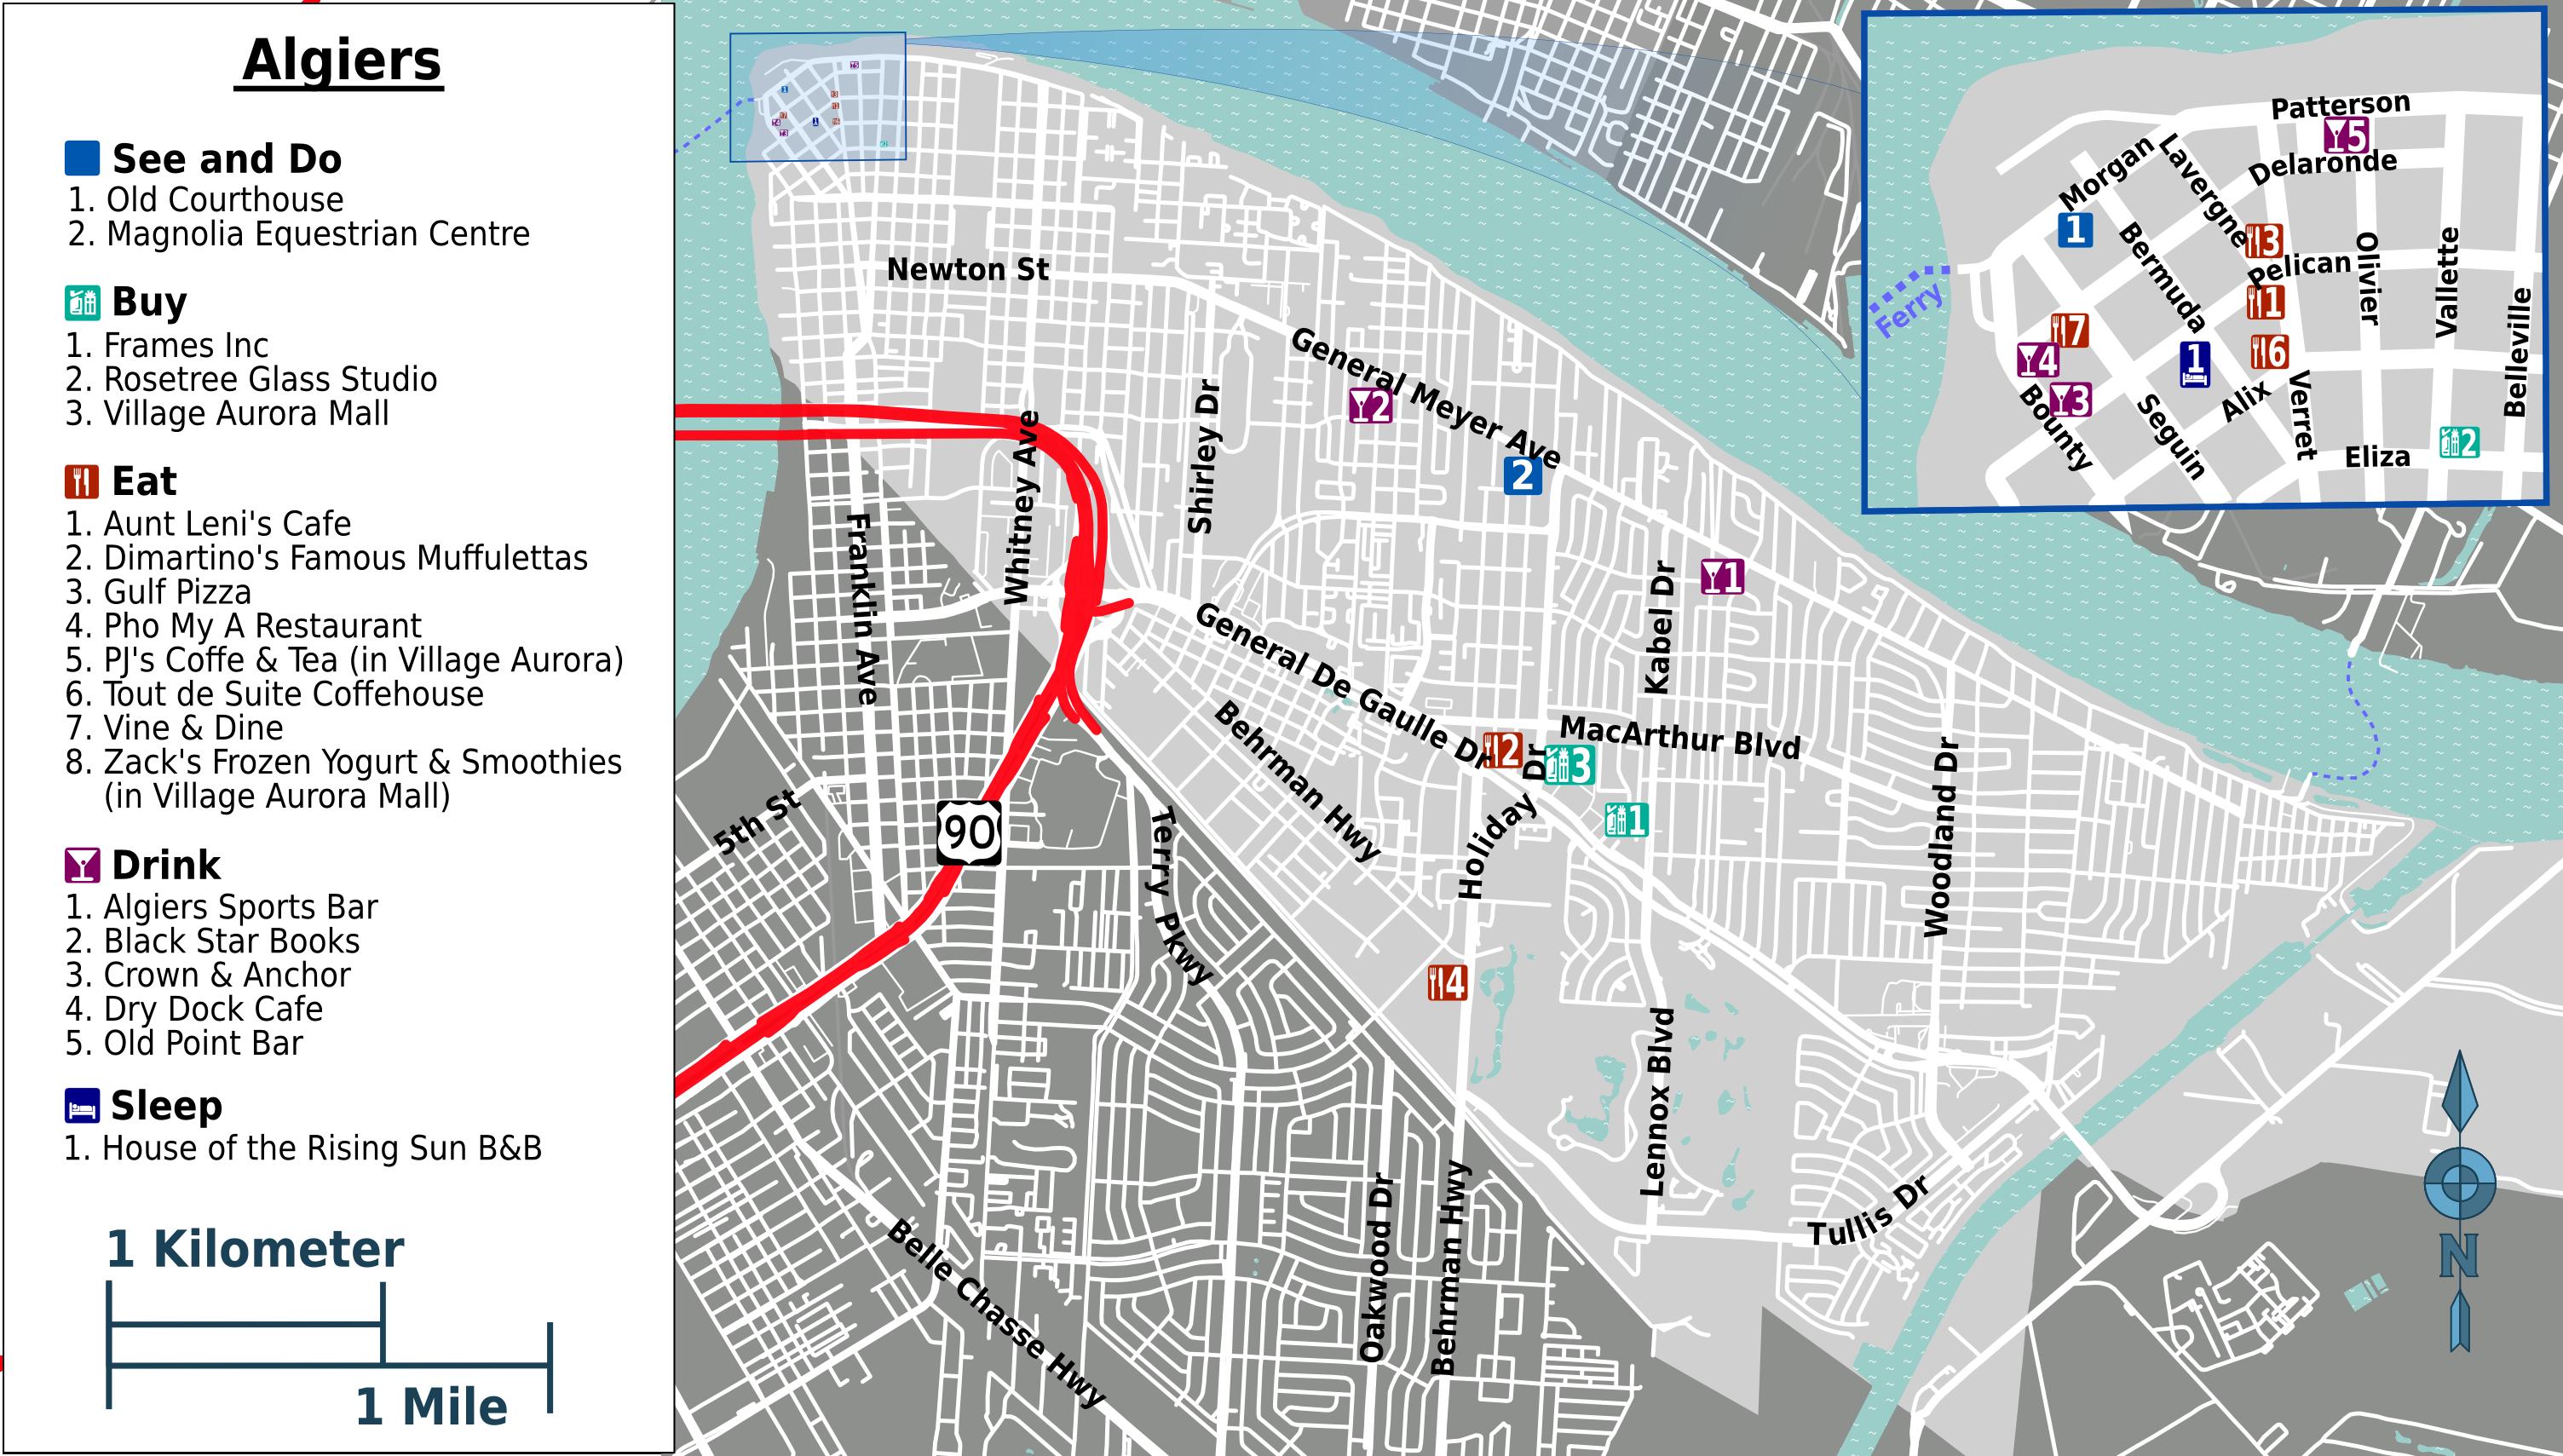 FileAlgiers NOLA mappng Wikimedia Commons